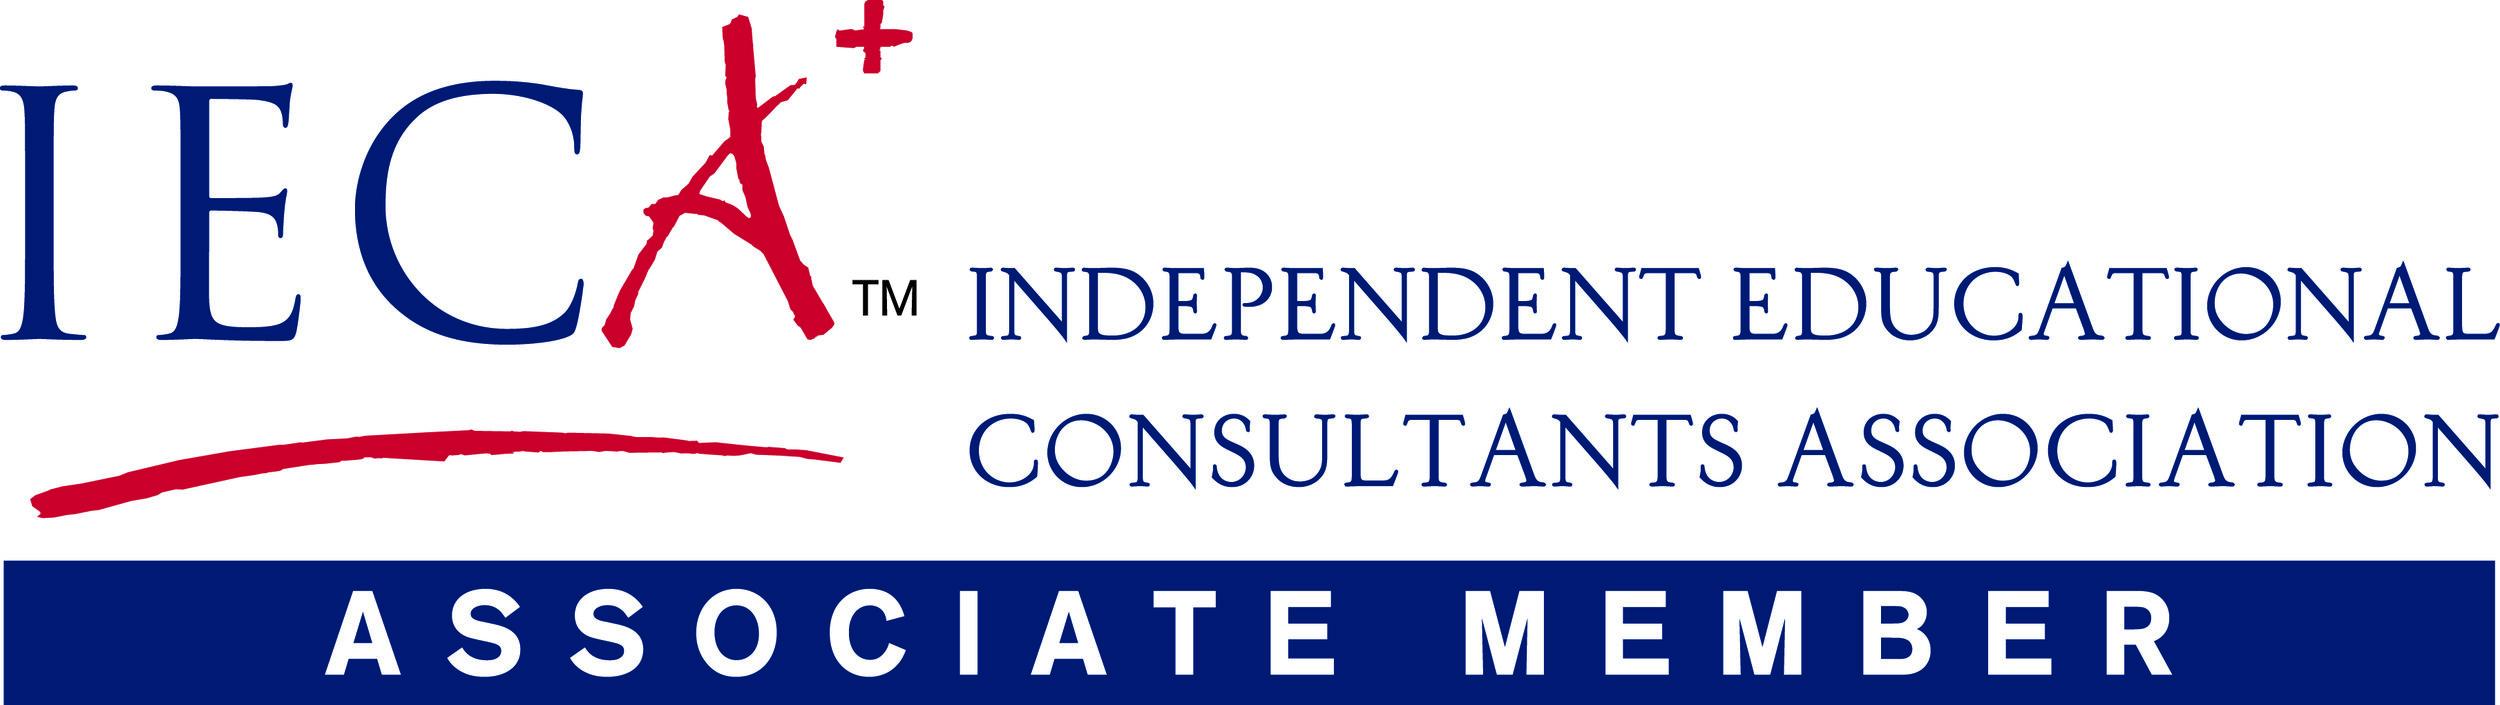 Associate Member | Independent Educational Consultants Association (IECA)